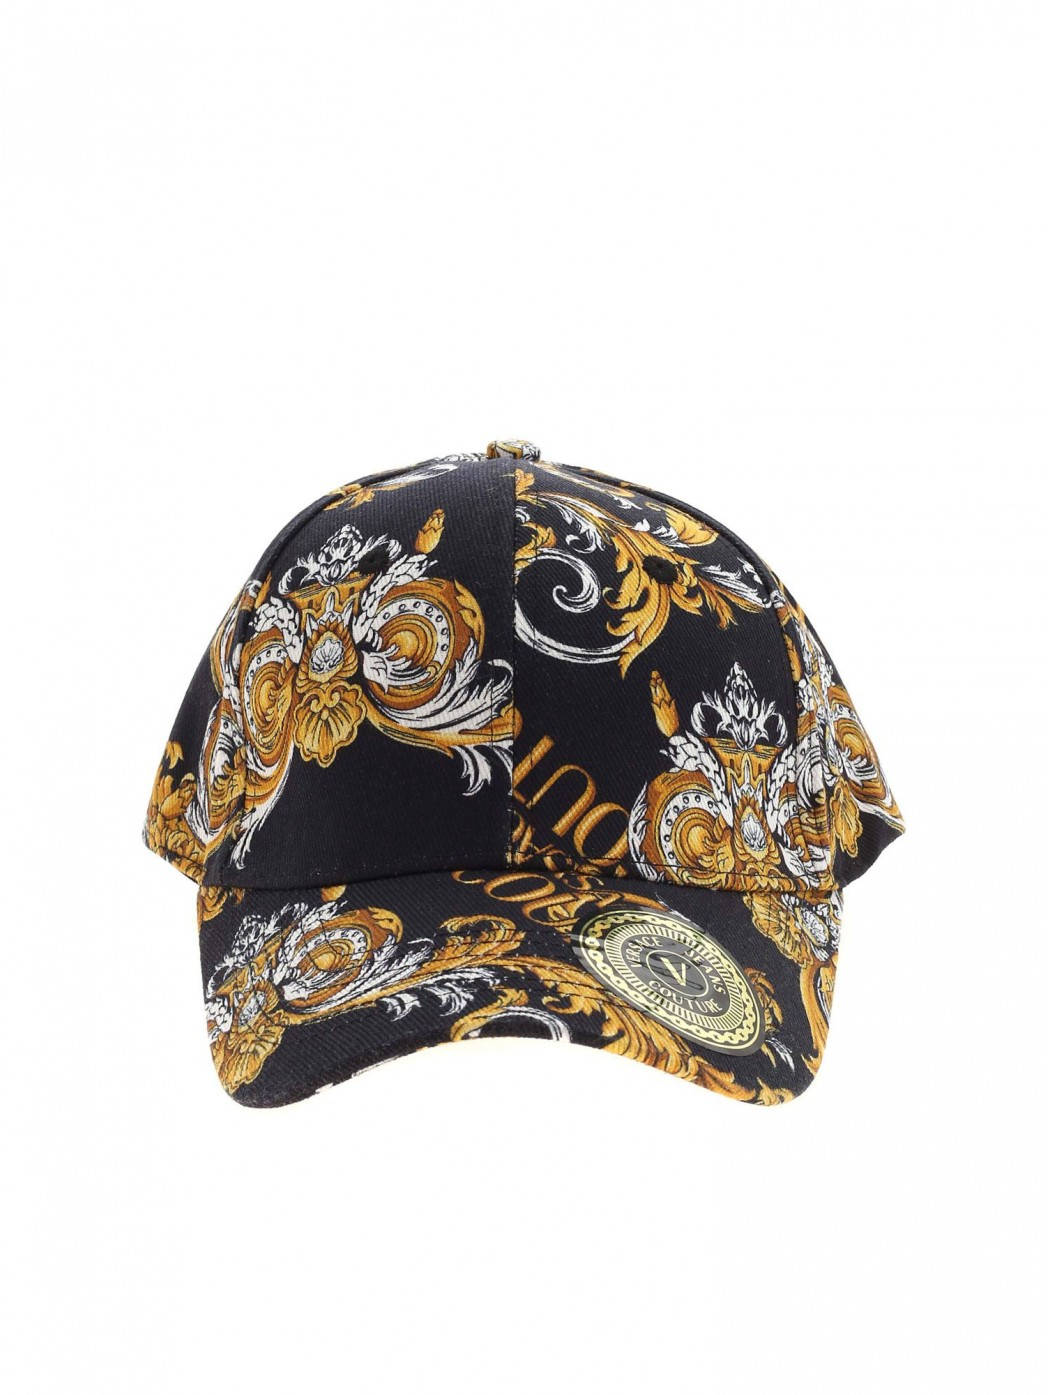 CAP VERSACE E8GZAK1285073 899